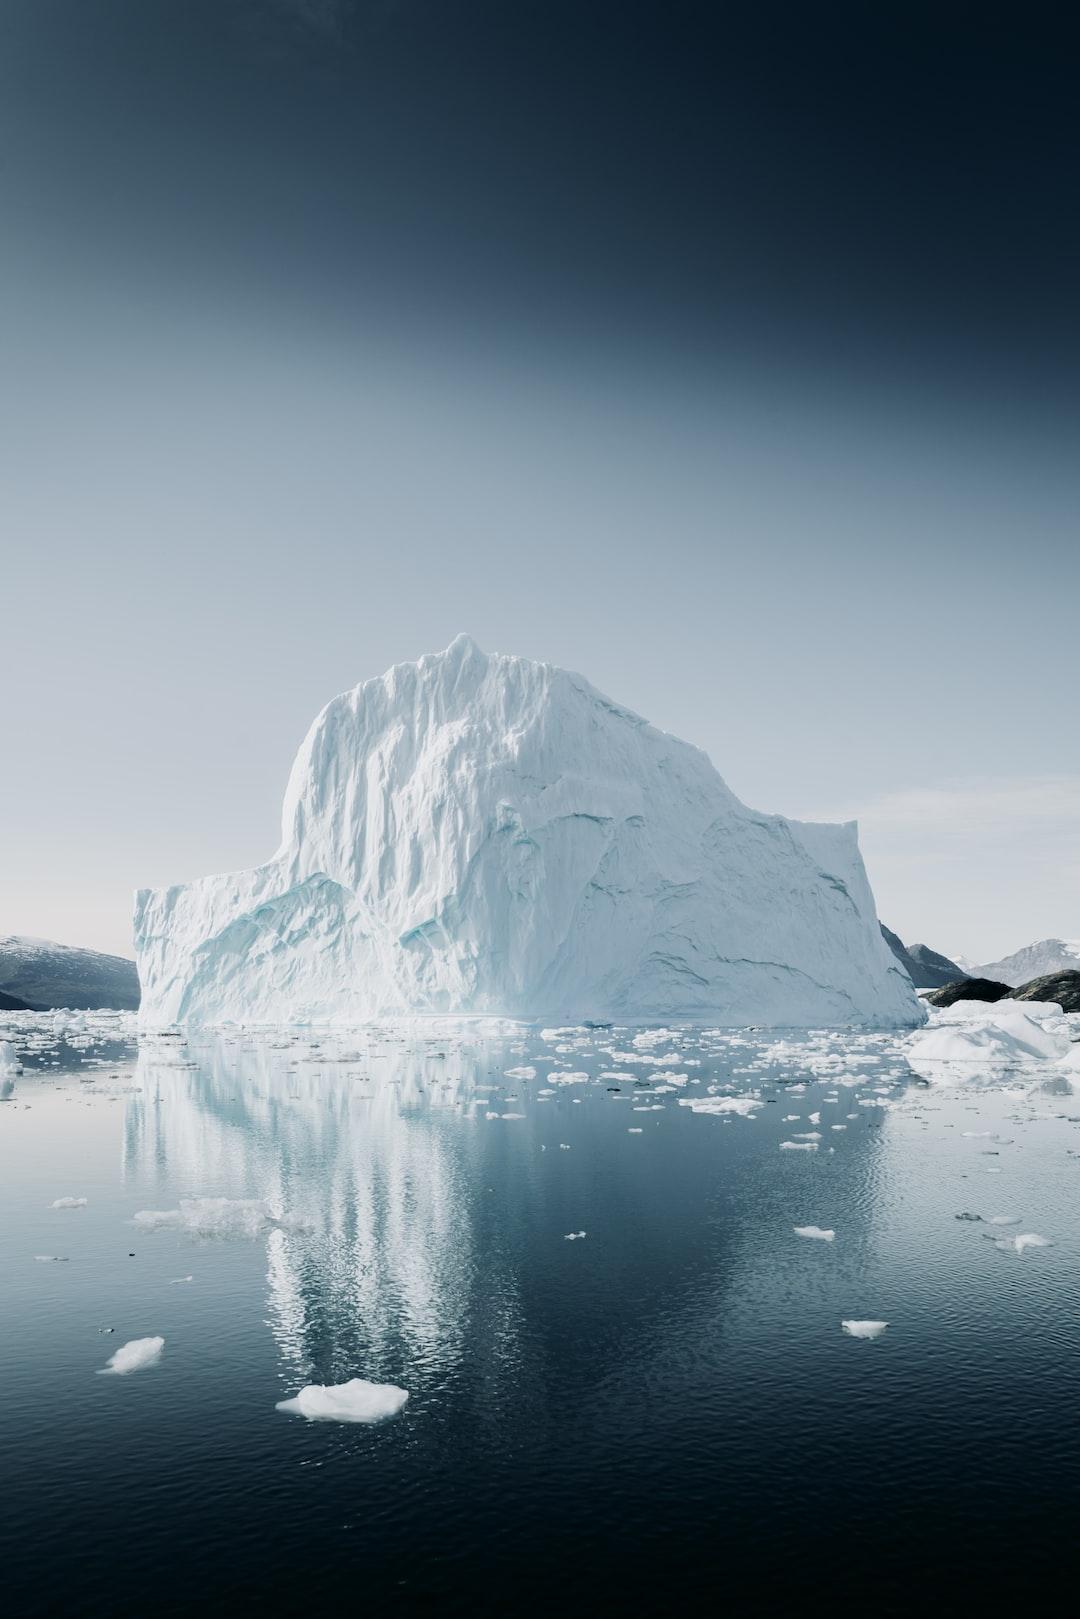 Arctic Iceberg, reflected